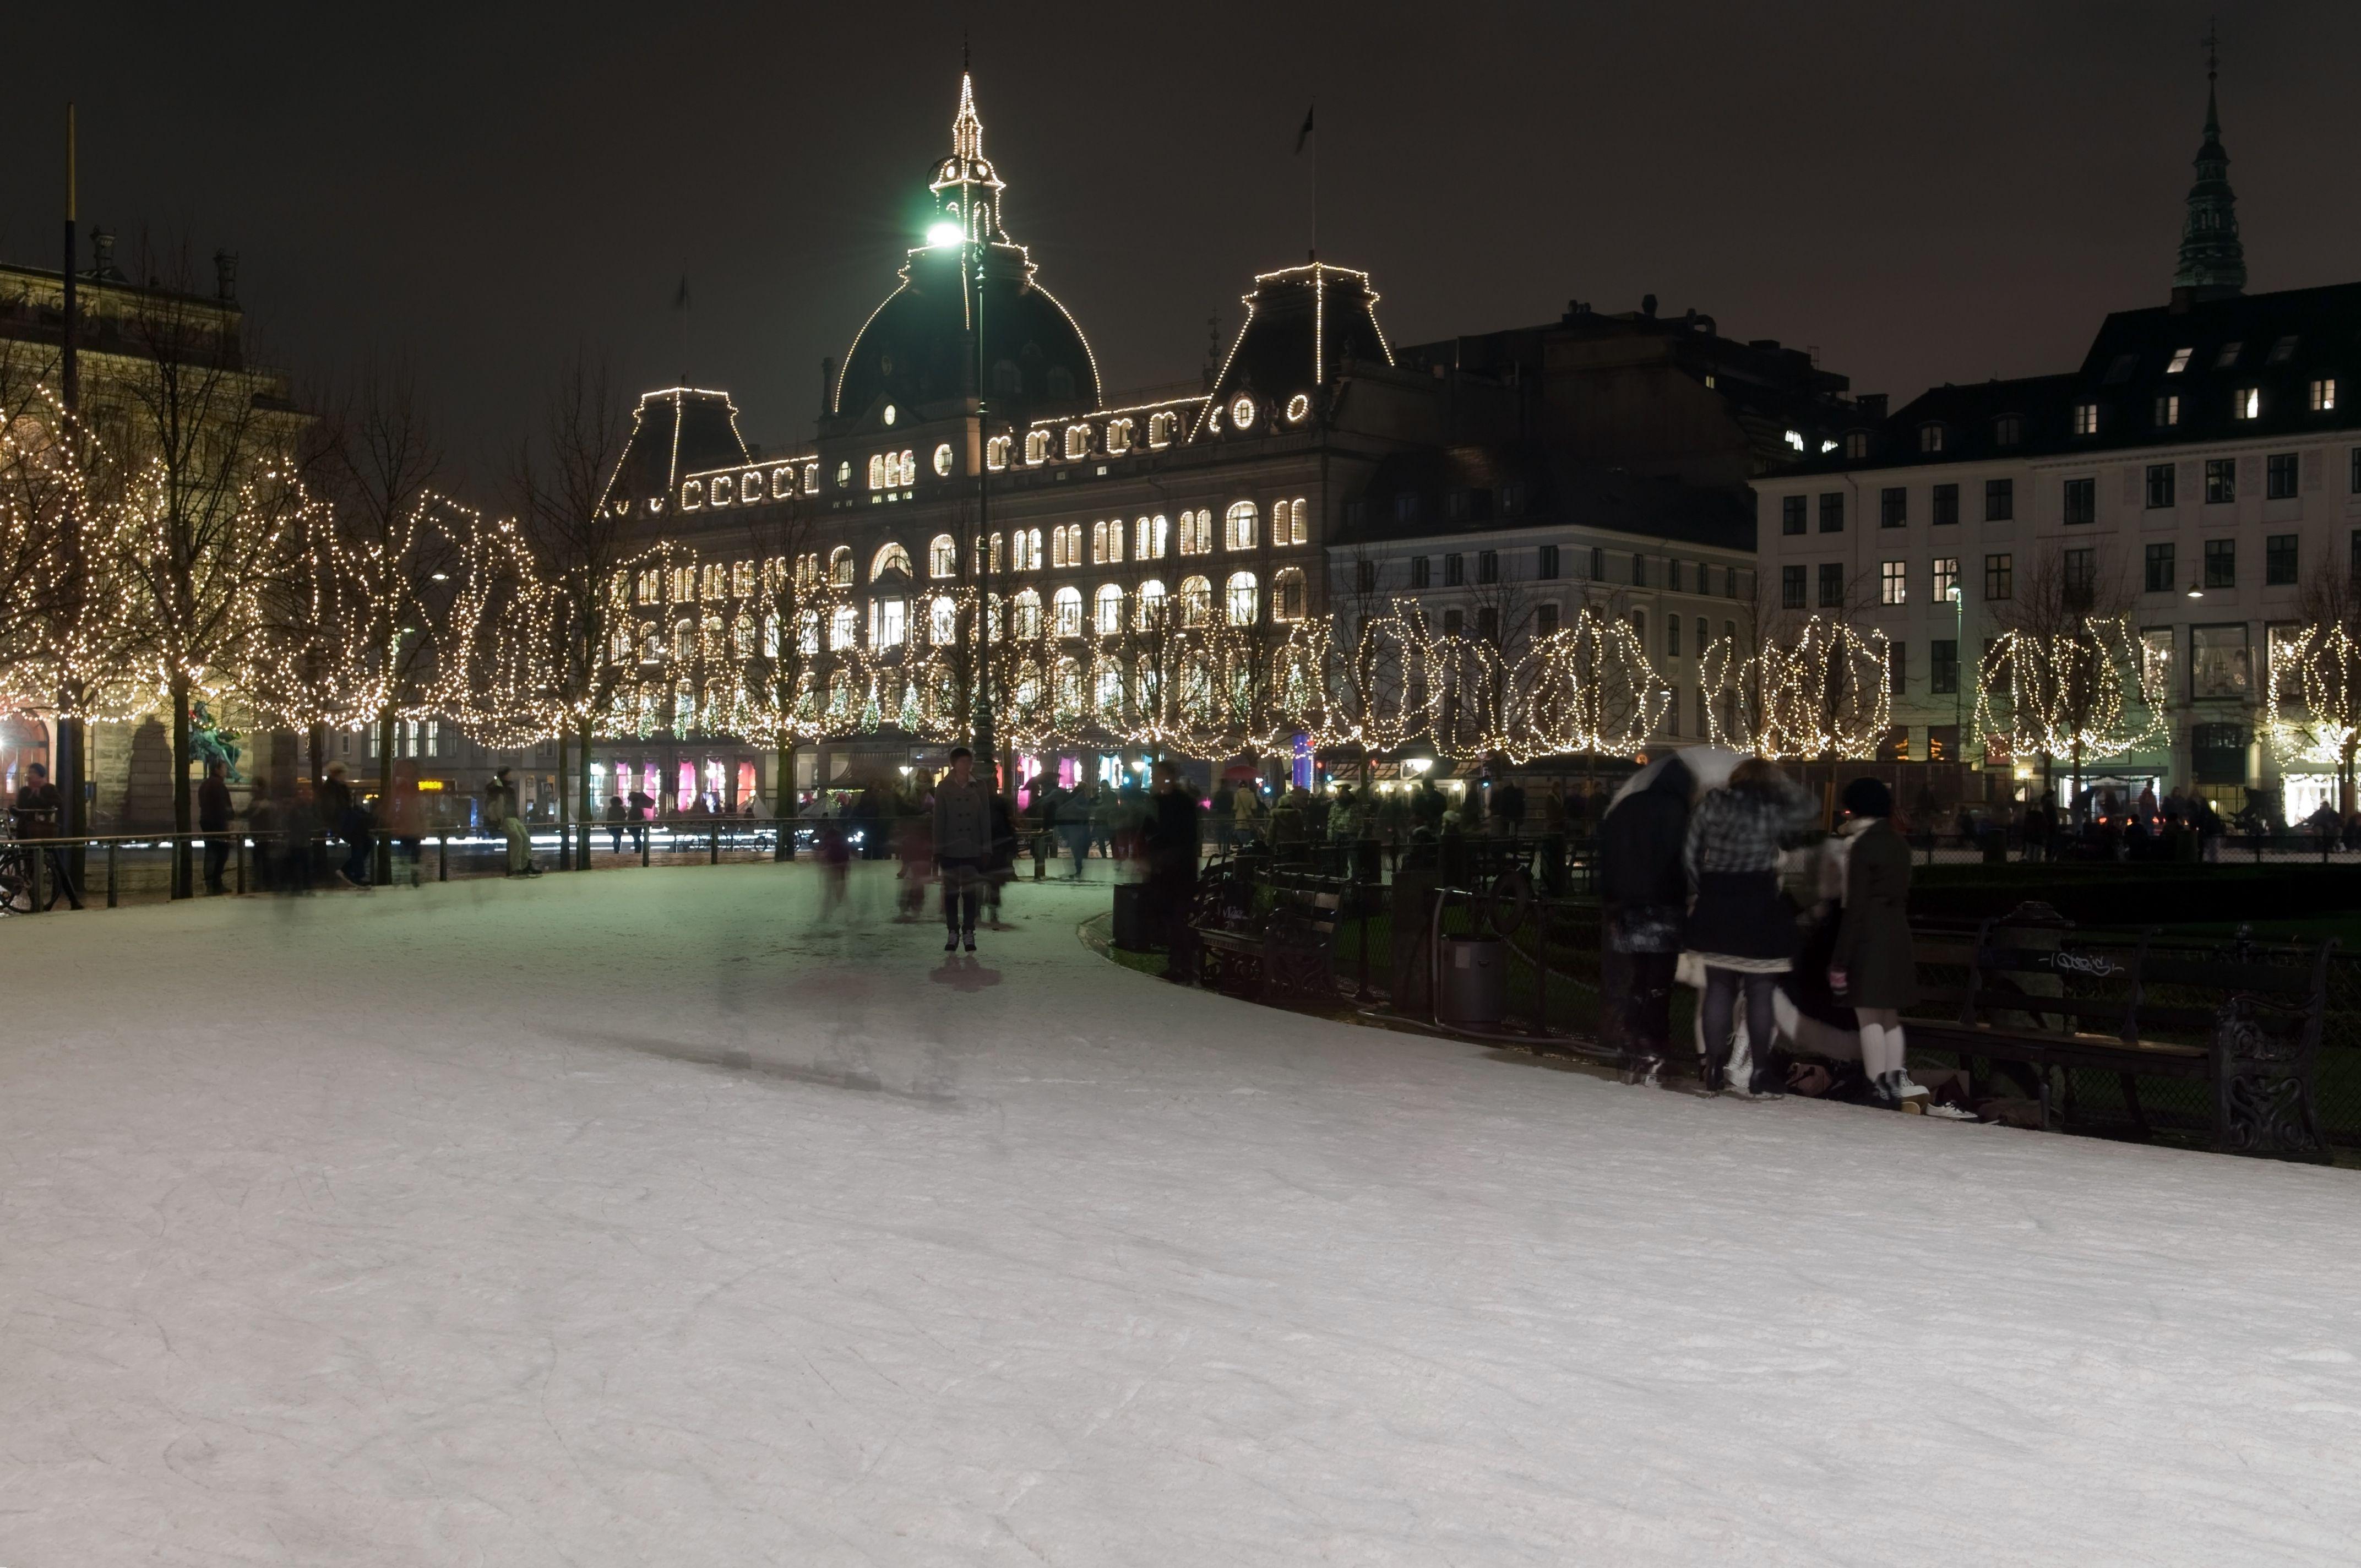 Ice Rink in Copenhagen at night.